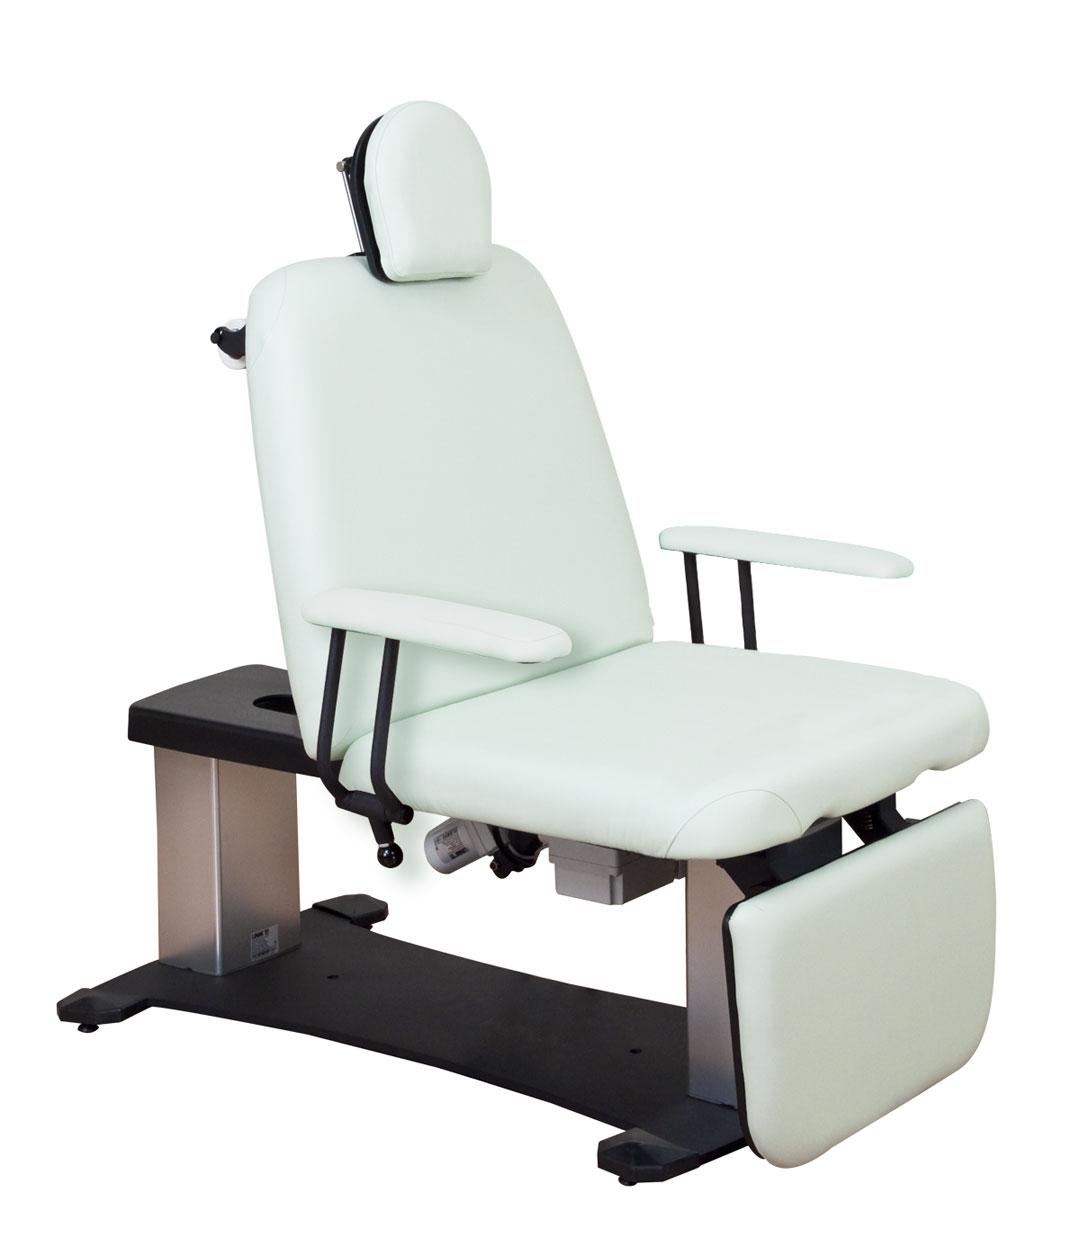 Oakworks 67651 Procedure Chair 100 Series W/ Arm Rests